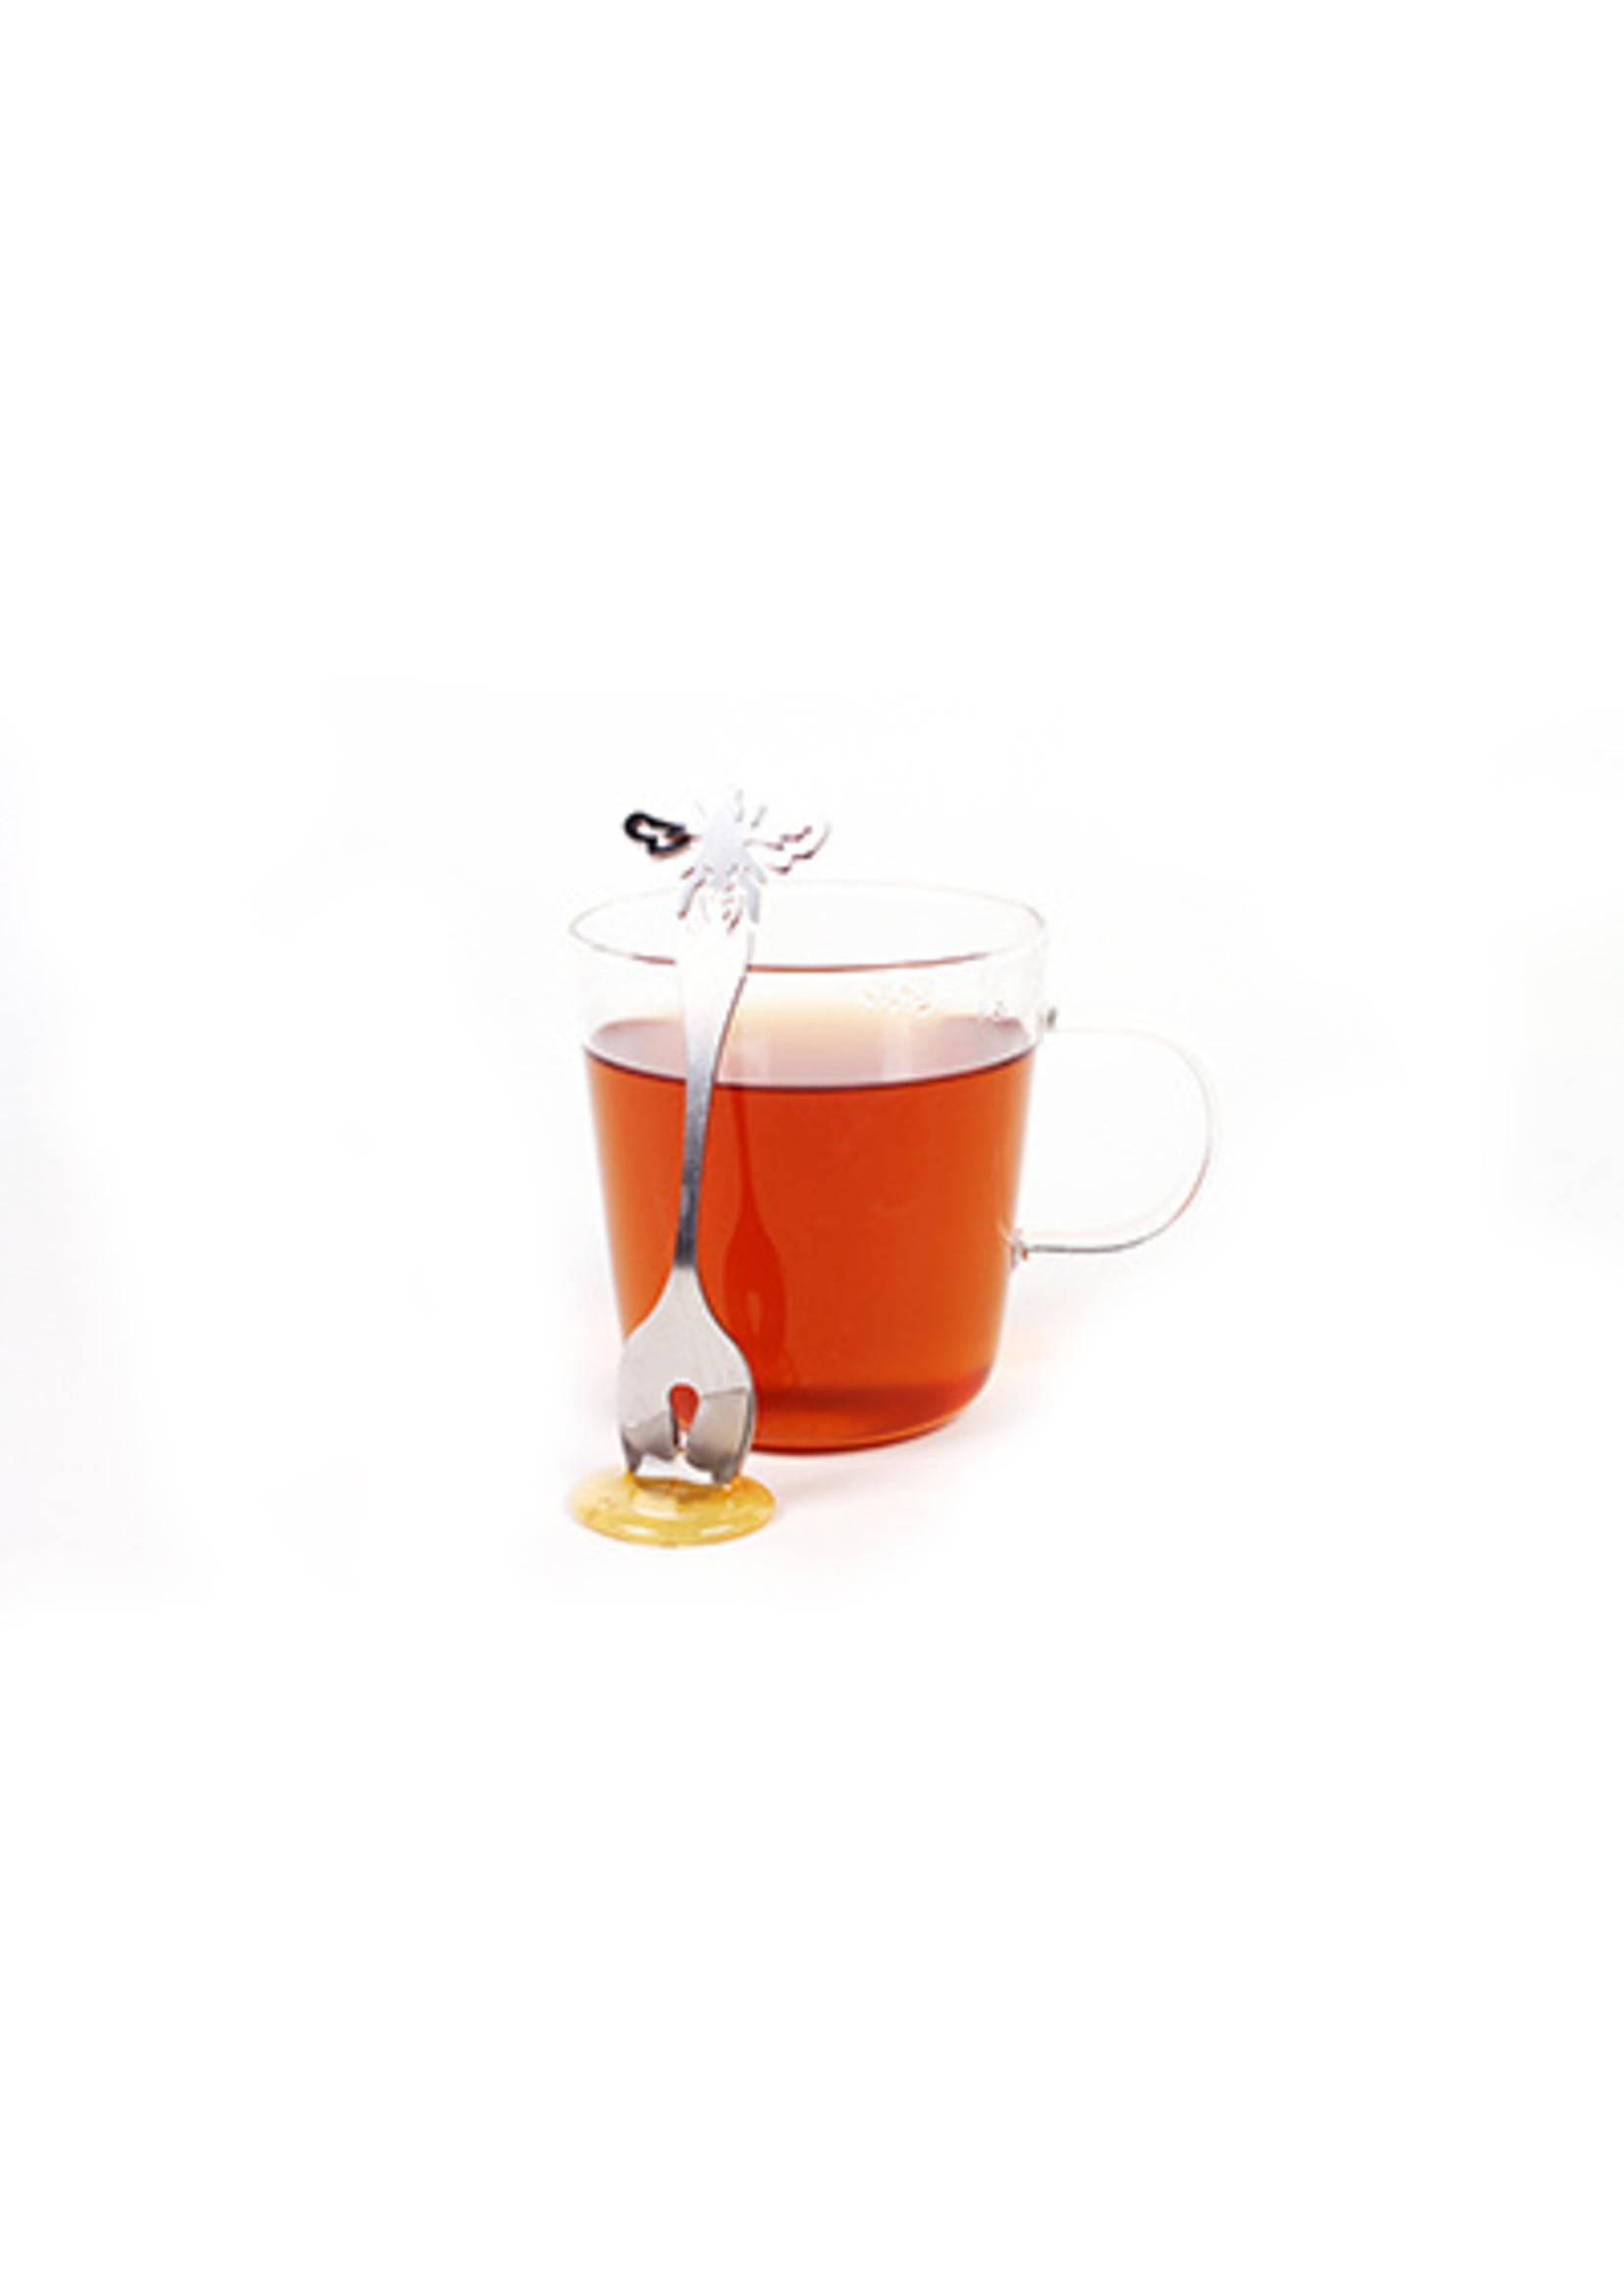 Honey spoon from Studio DaG